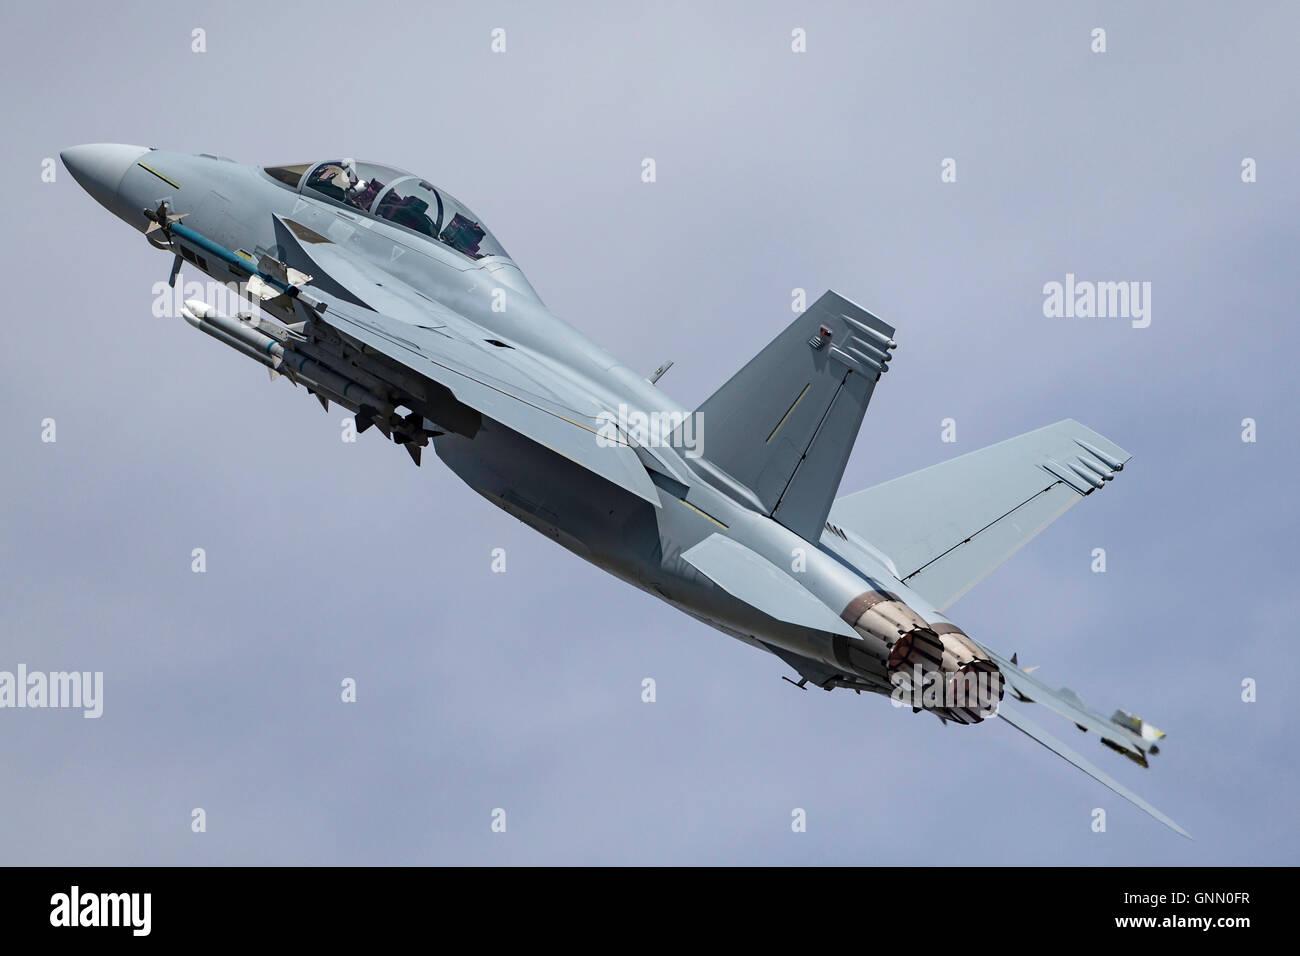 Marina de los Estados Unidos, Boeing F/A-18F Super Hornet cazas multirole. Foto de stock